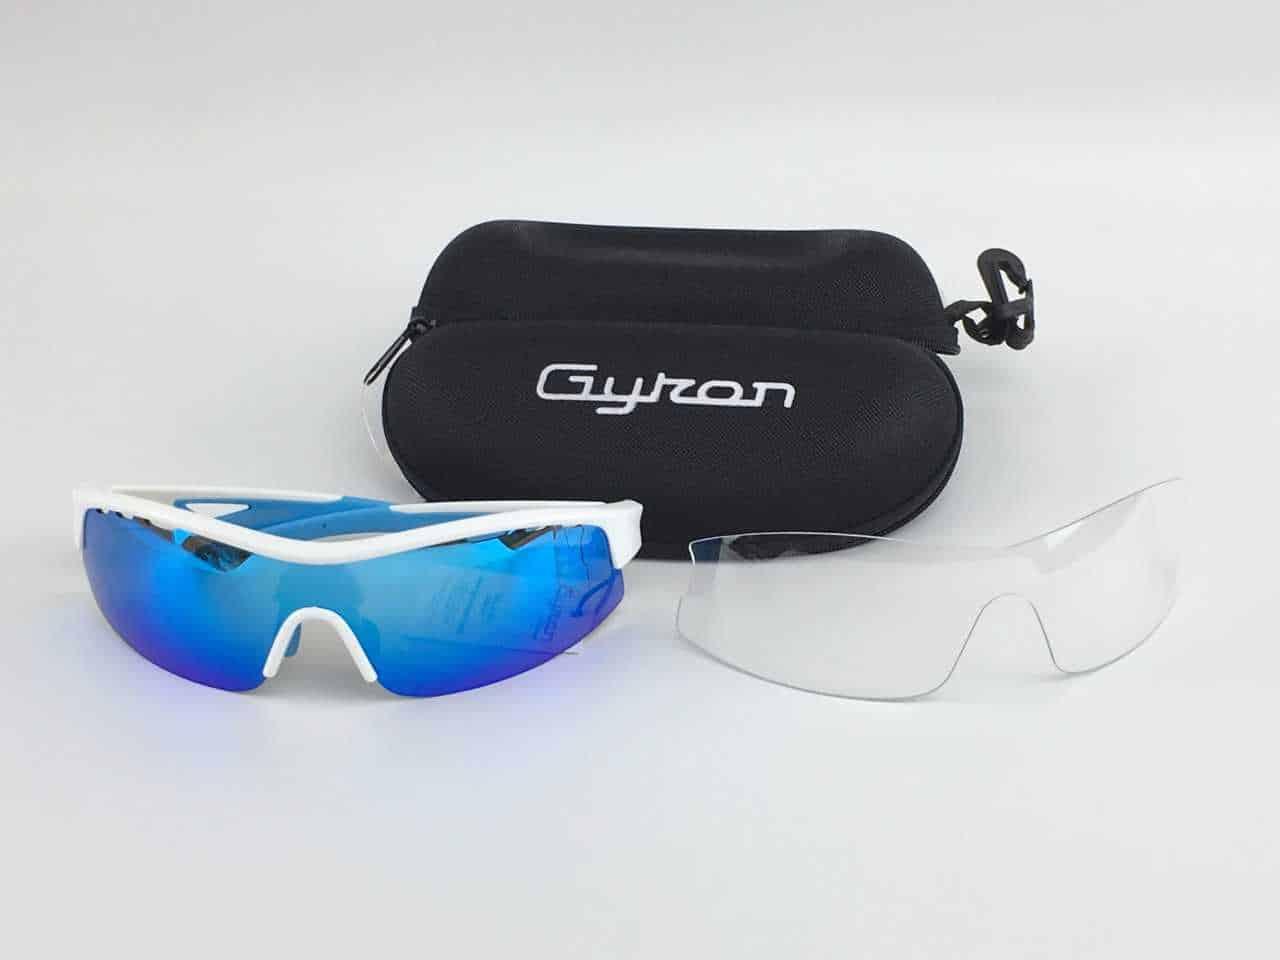 lunette gyron blanc